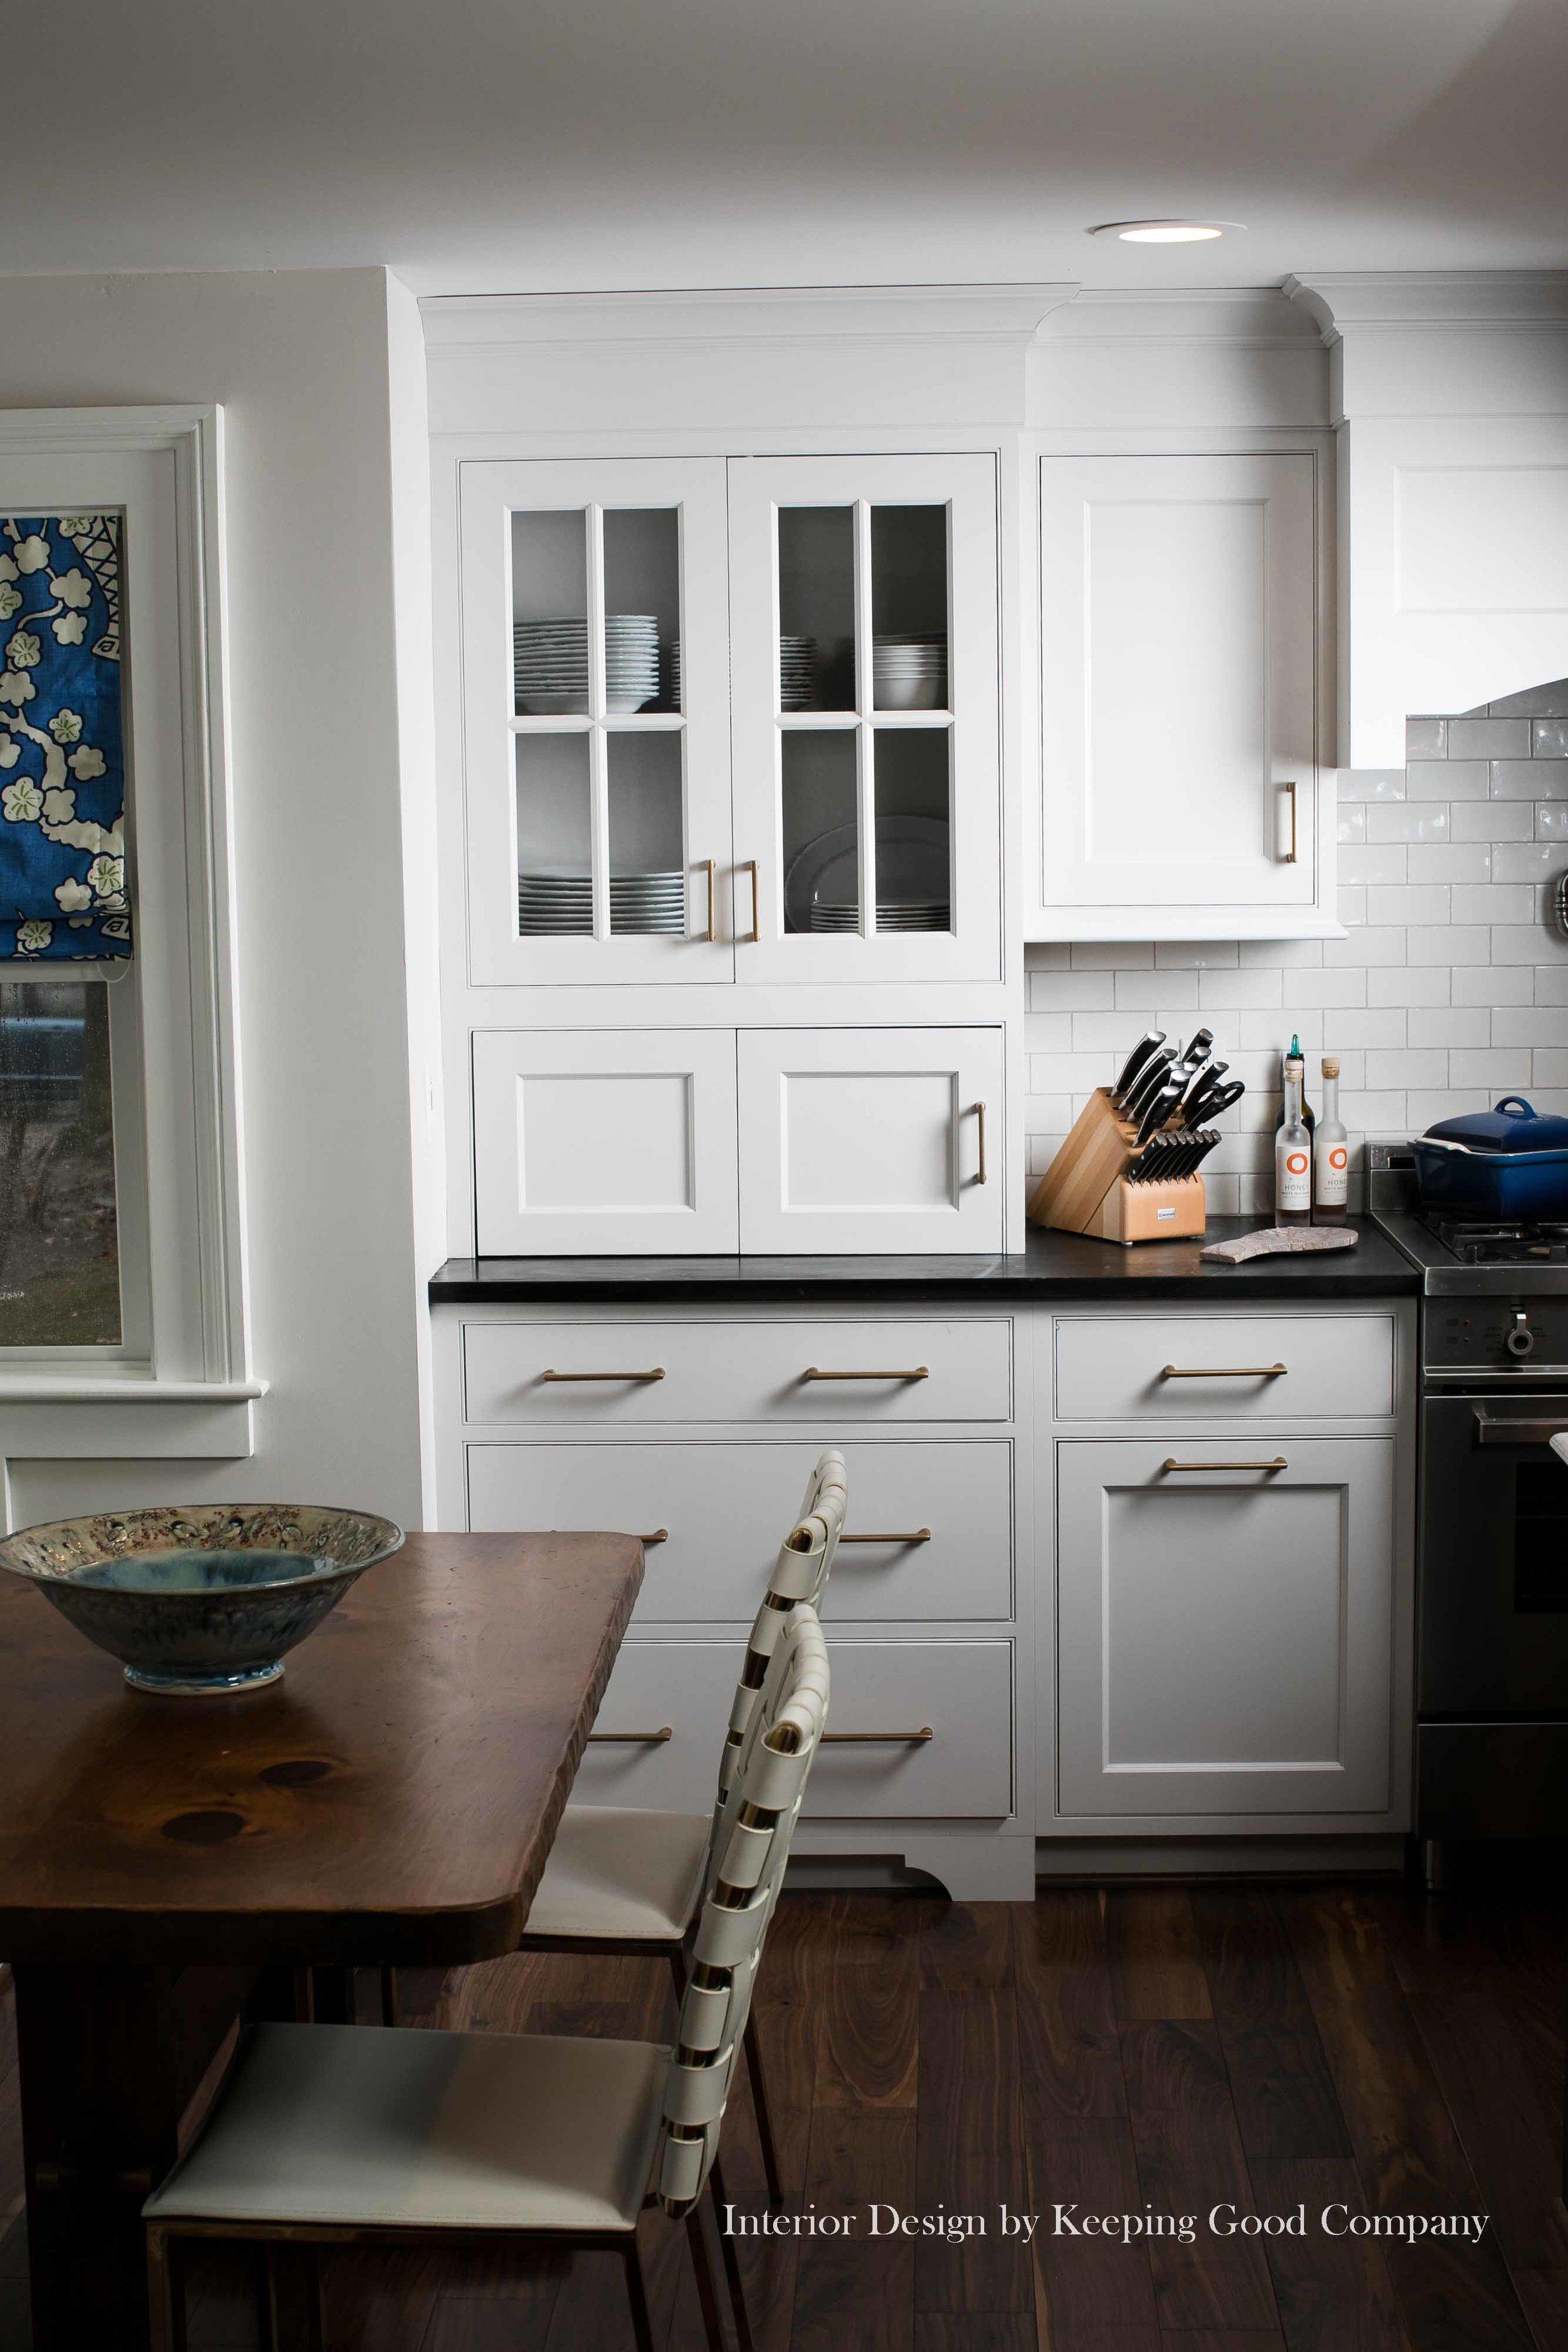 Appliance Garage Bi-folding Doors,Glass Mullion Cabinet Doors